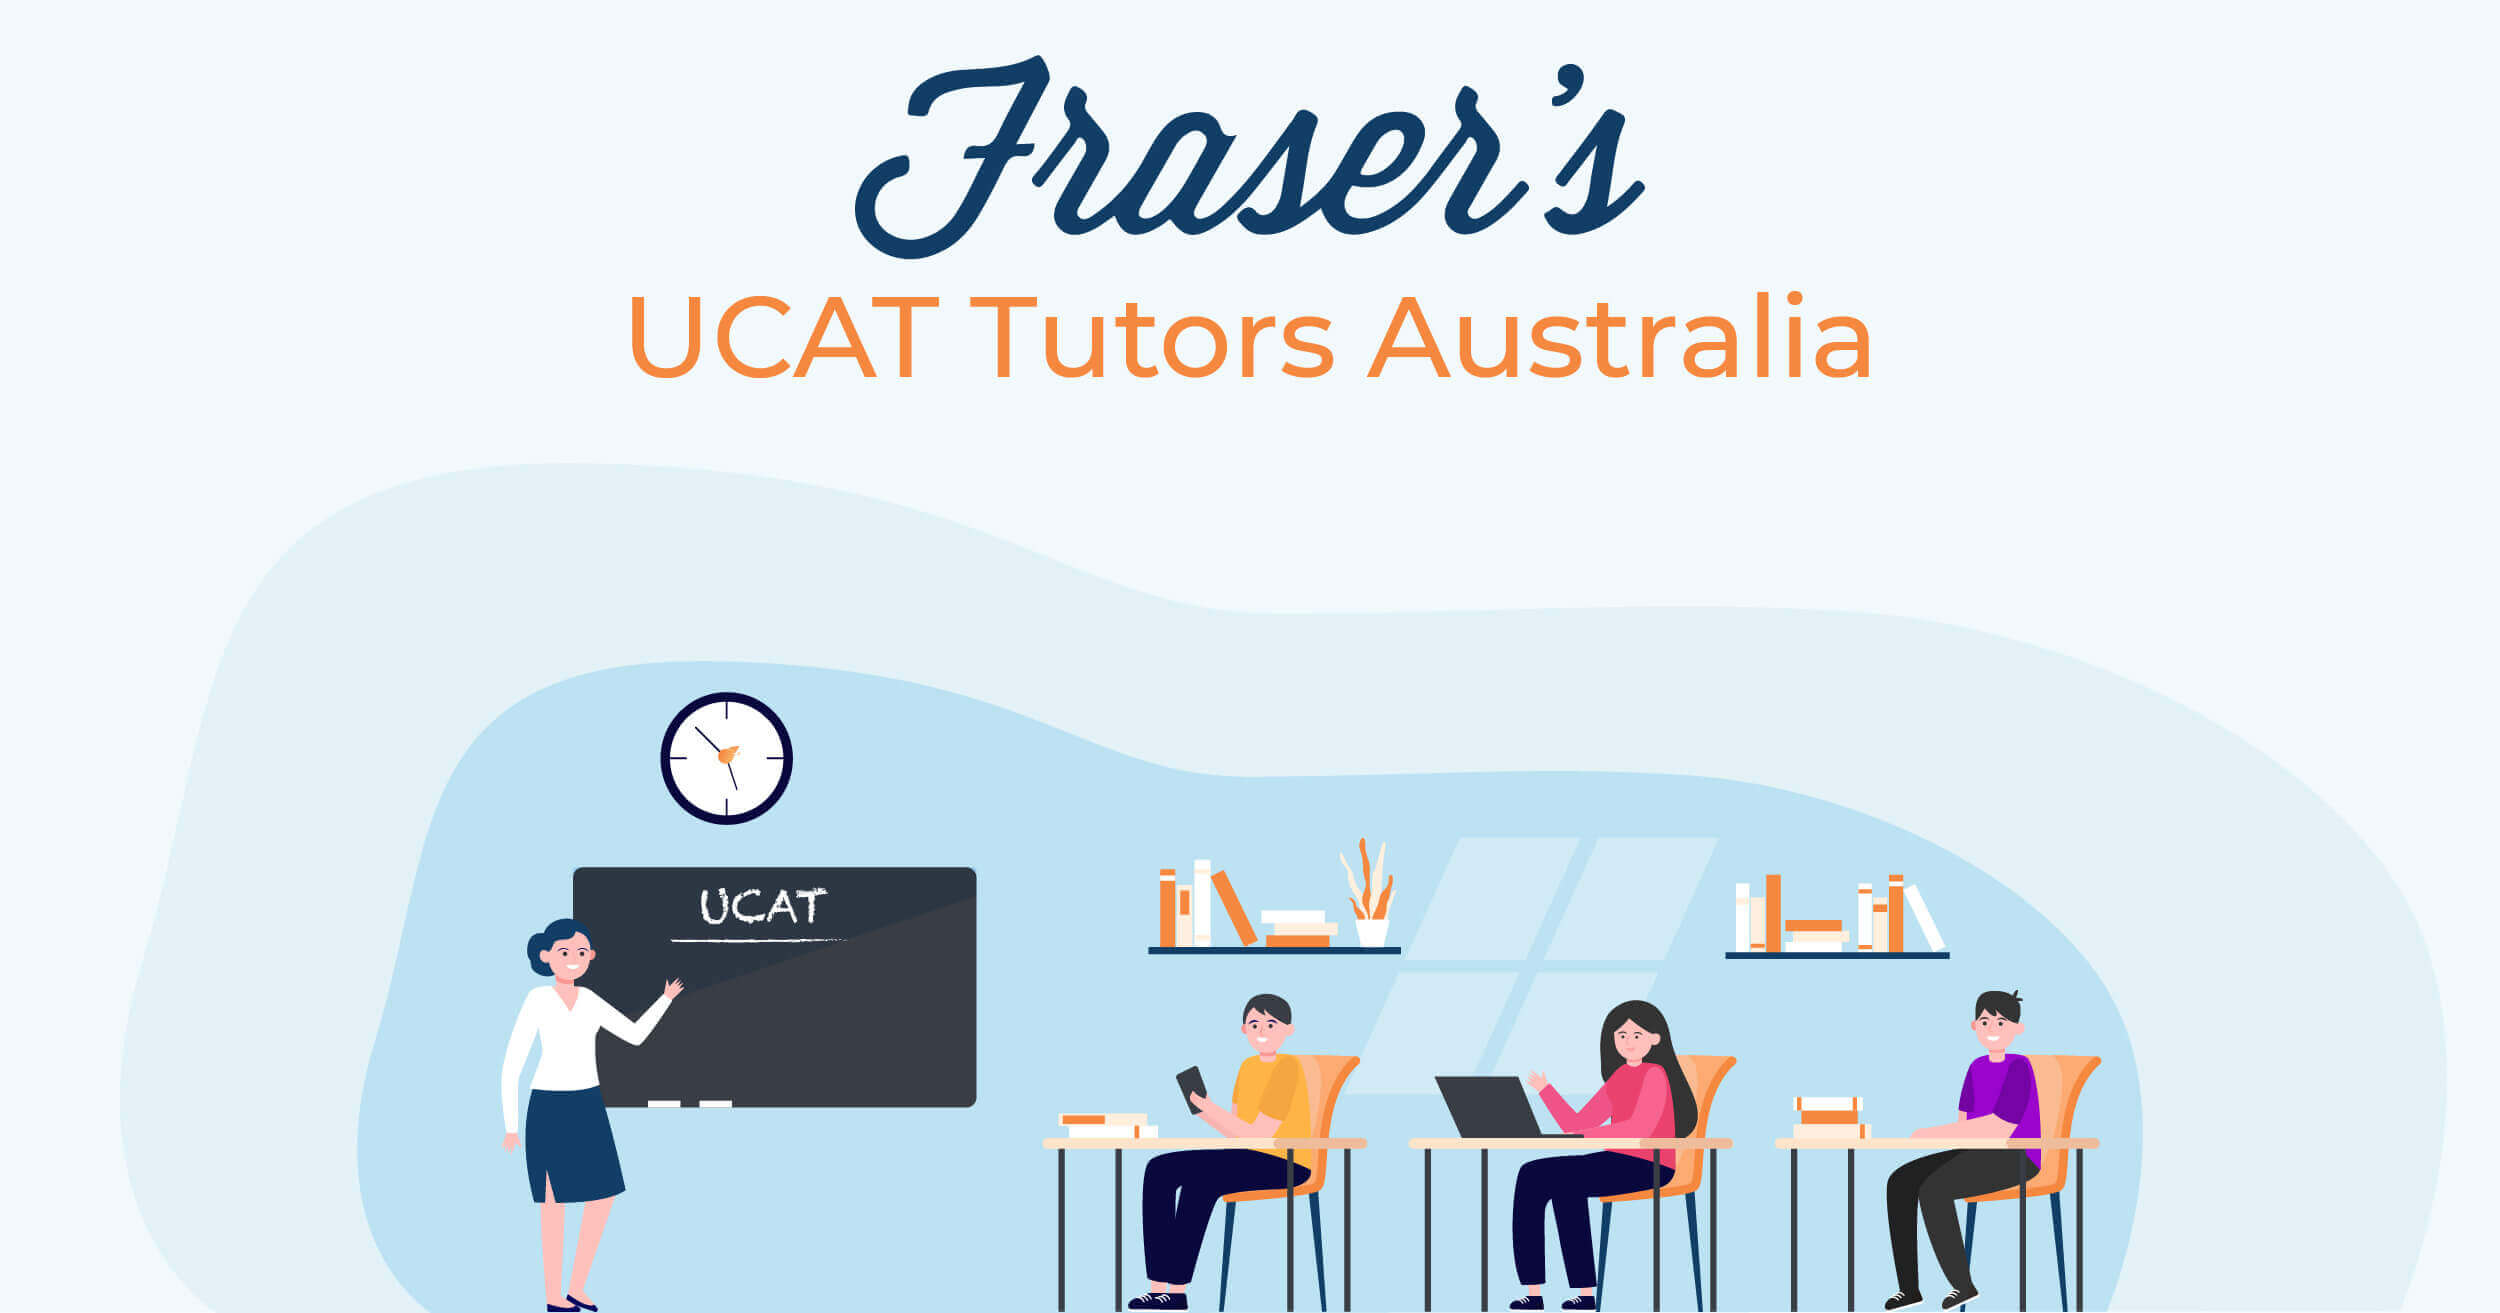 Fraser's UCAT Tutors | Australia featured image